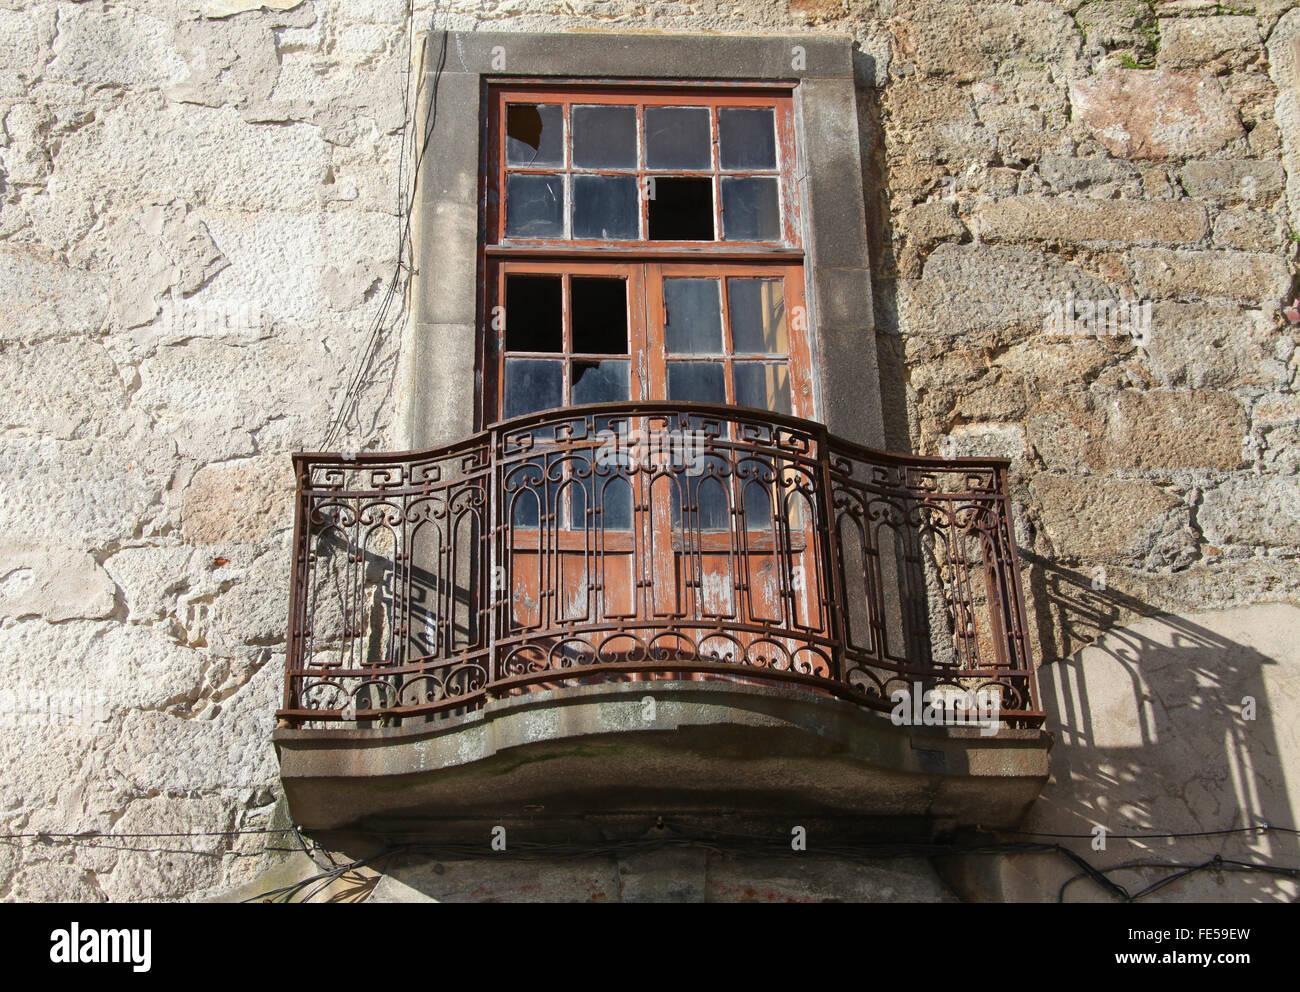 Old window in the Portuguese city of Porto - Stock Image